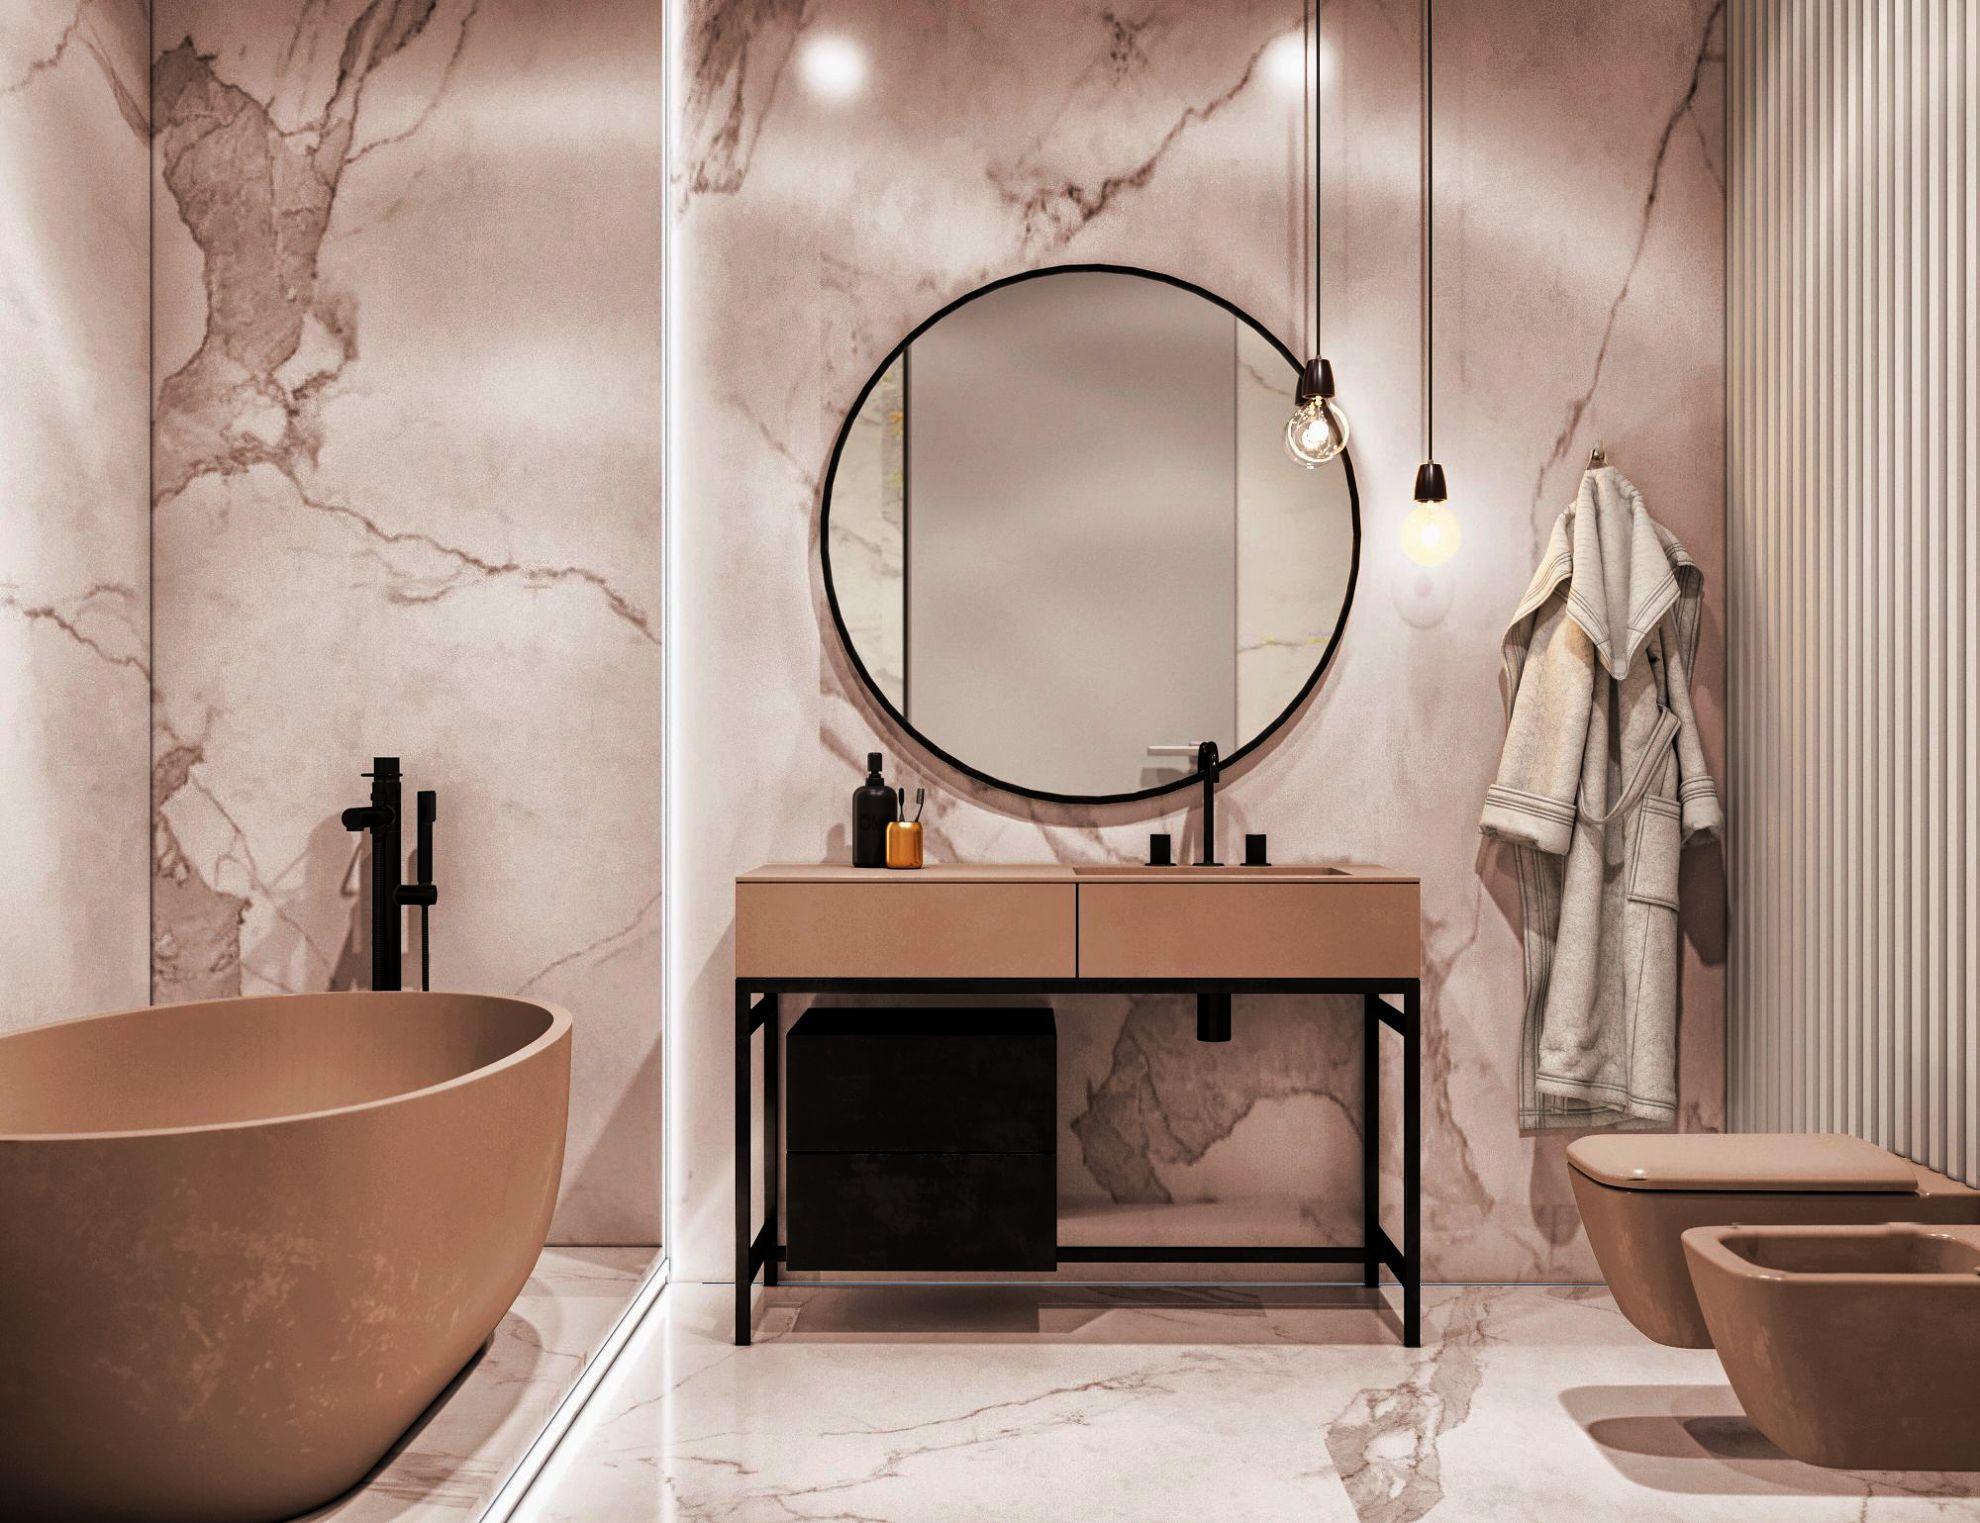 Christmas Bathroom Decor Kohls Bathroom Interior Design Sketches